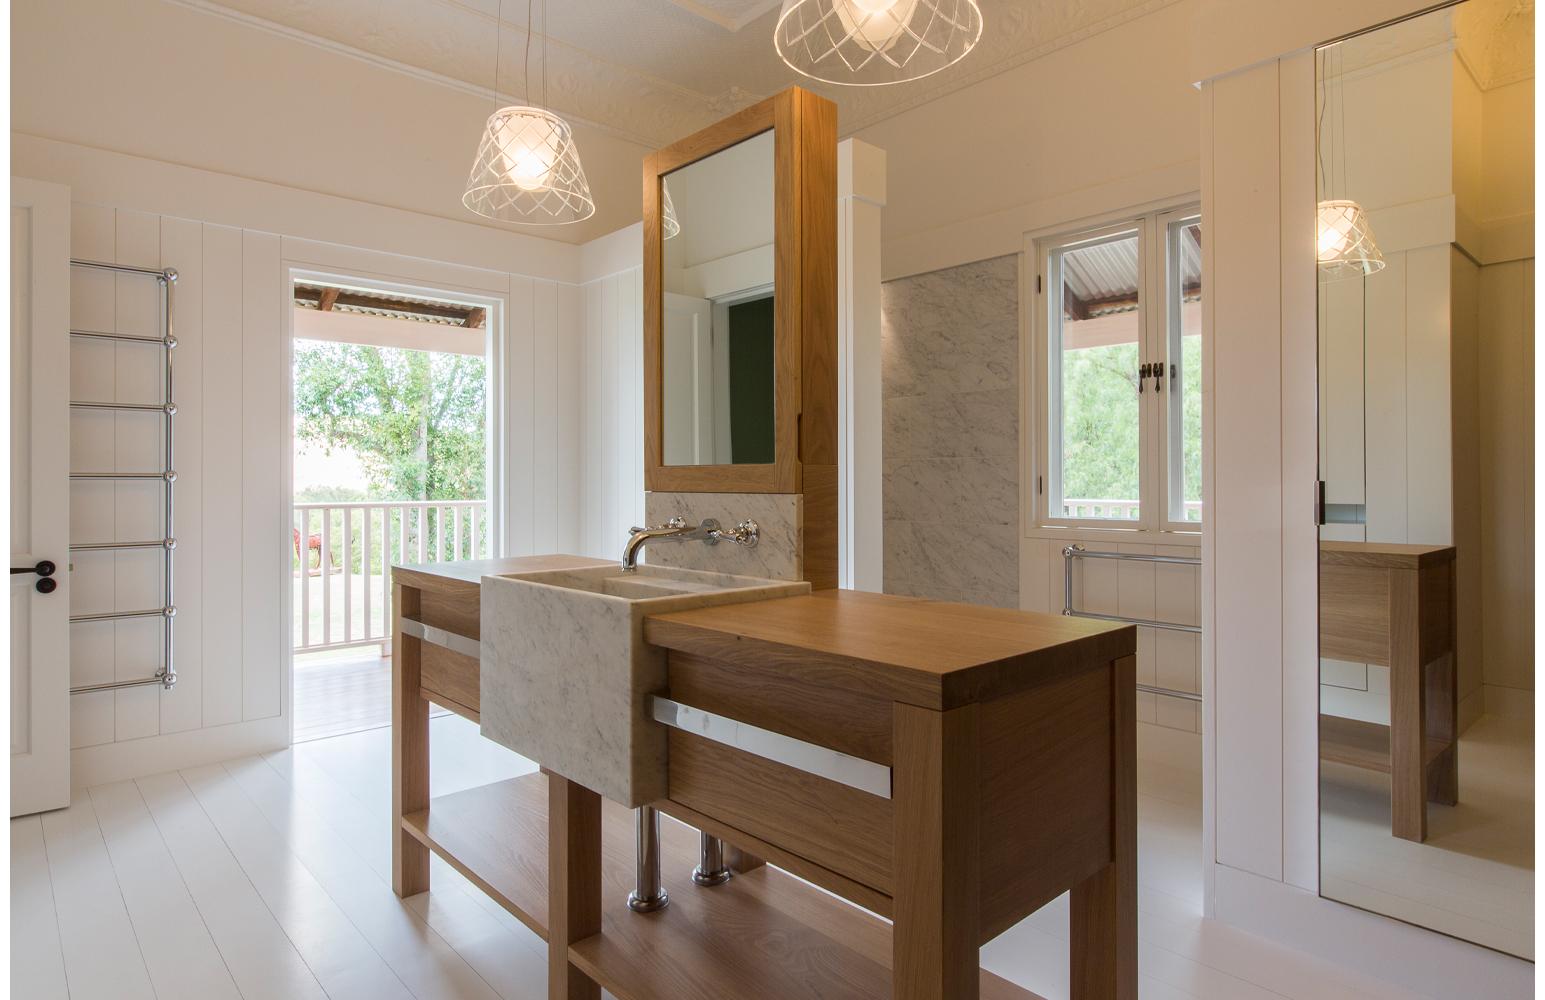 maek-luxury-home-design-inspiration-toodyay-bathroom-gallery-11.jpg